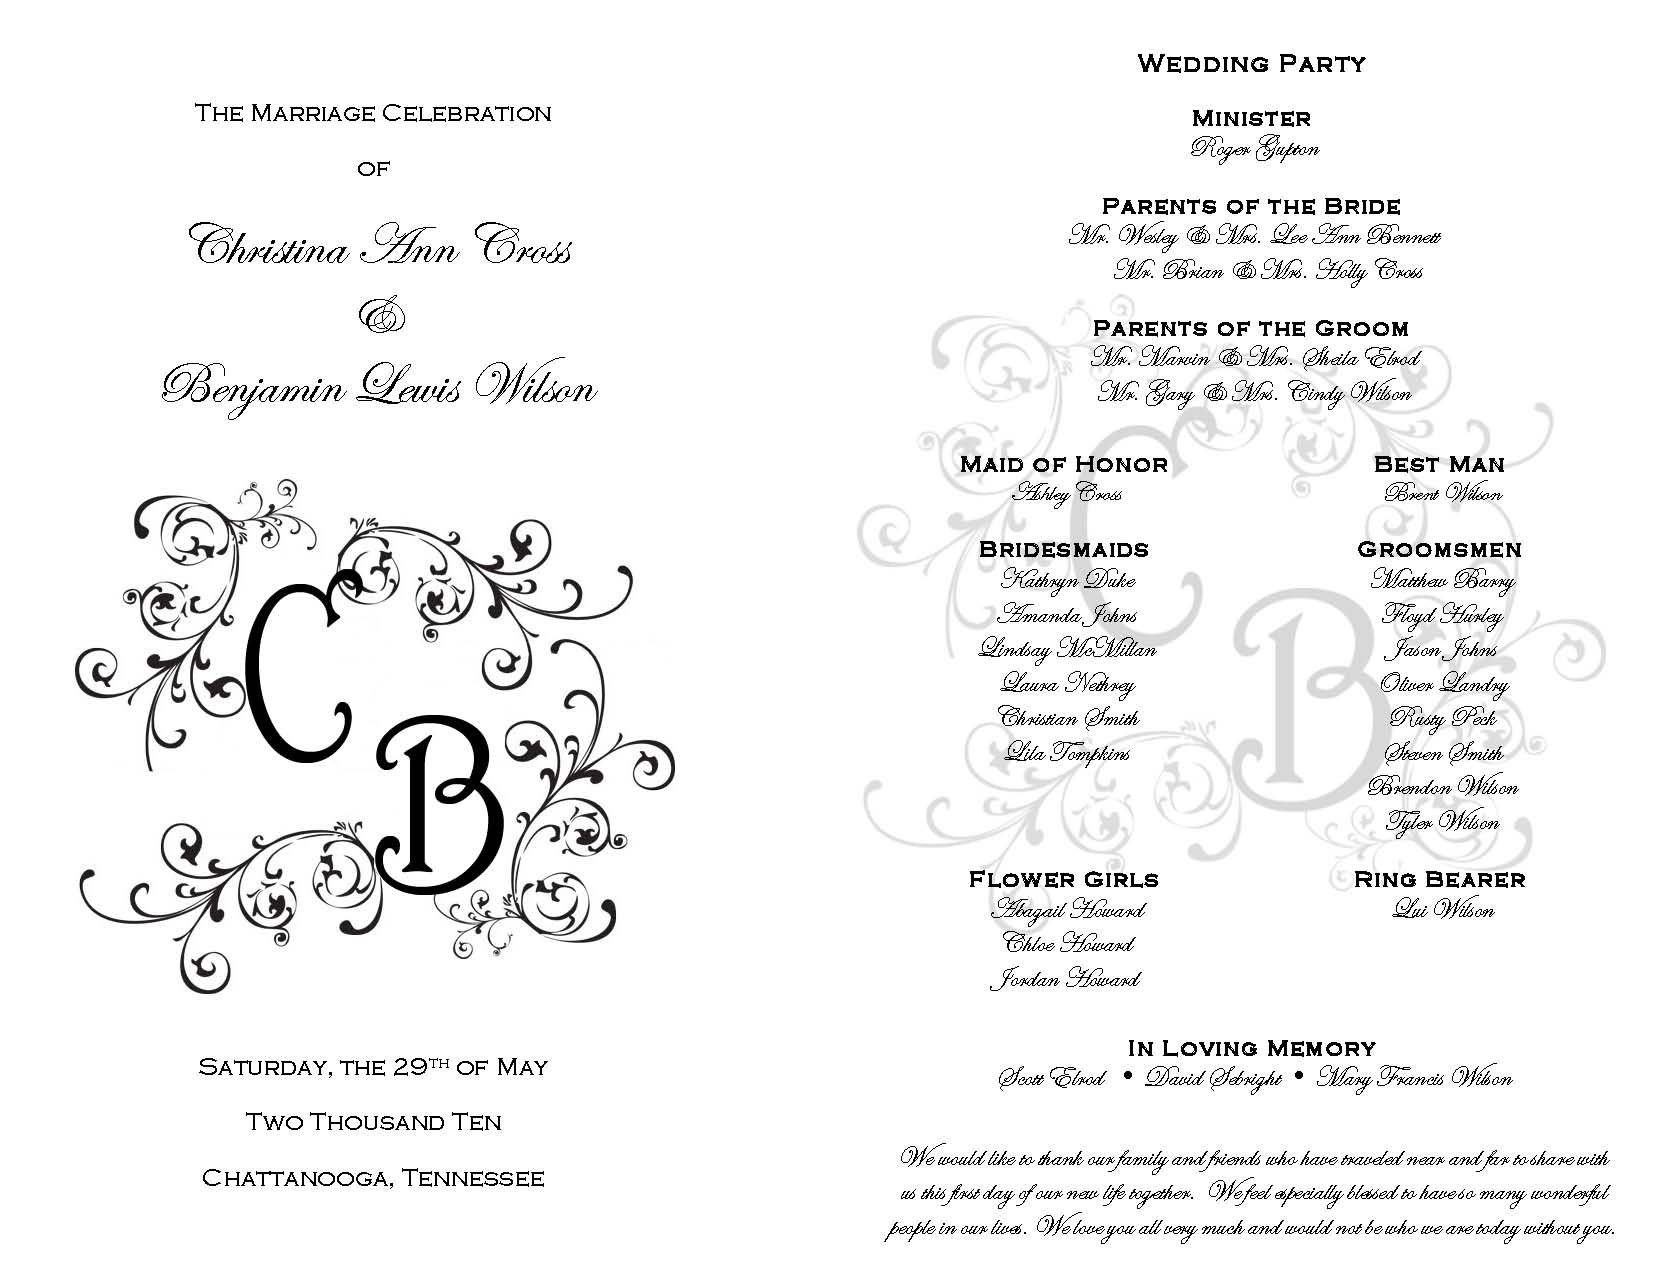 Free Downloadable Wedding Programs Templates Printable Wedding Programs On Pinterest